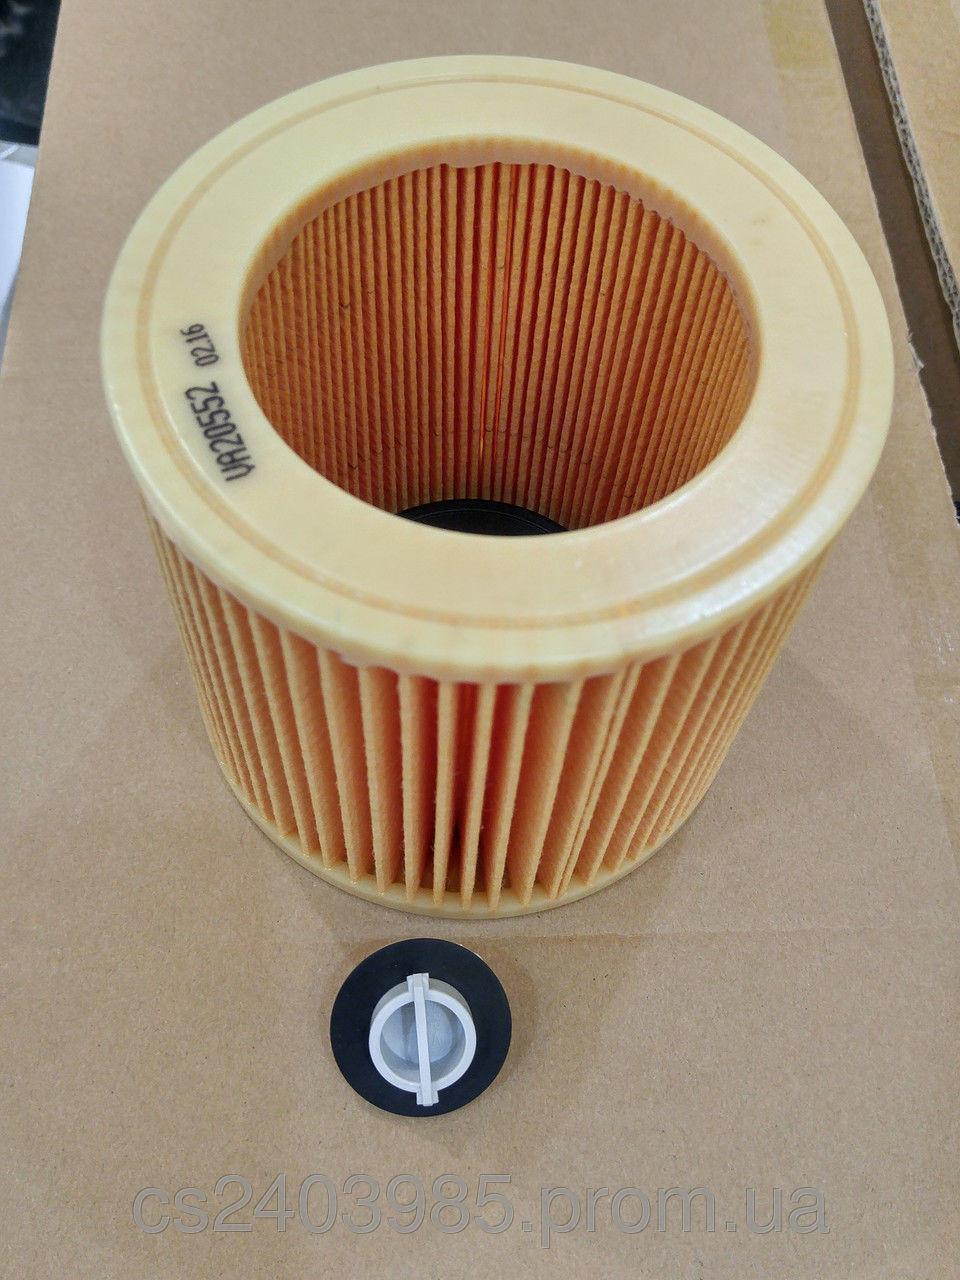 патронный фильтр для Wd2 Wd3 Karcher Karcher 6 414 552 0 аналог